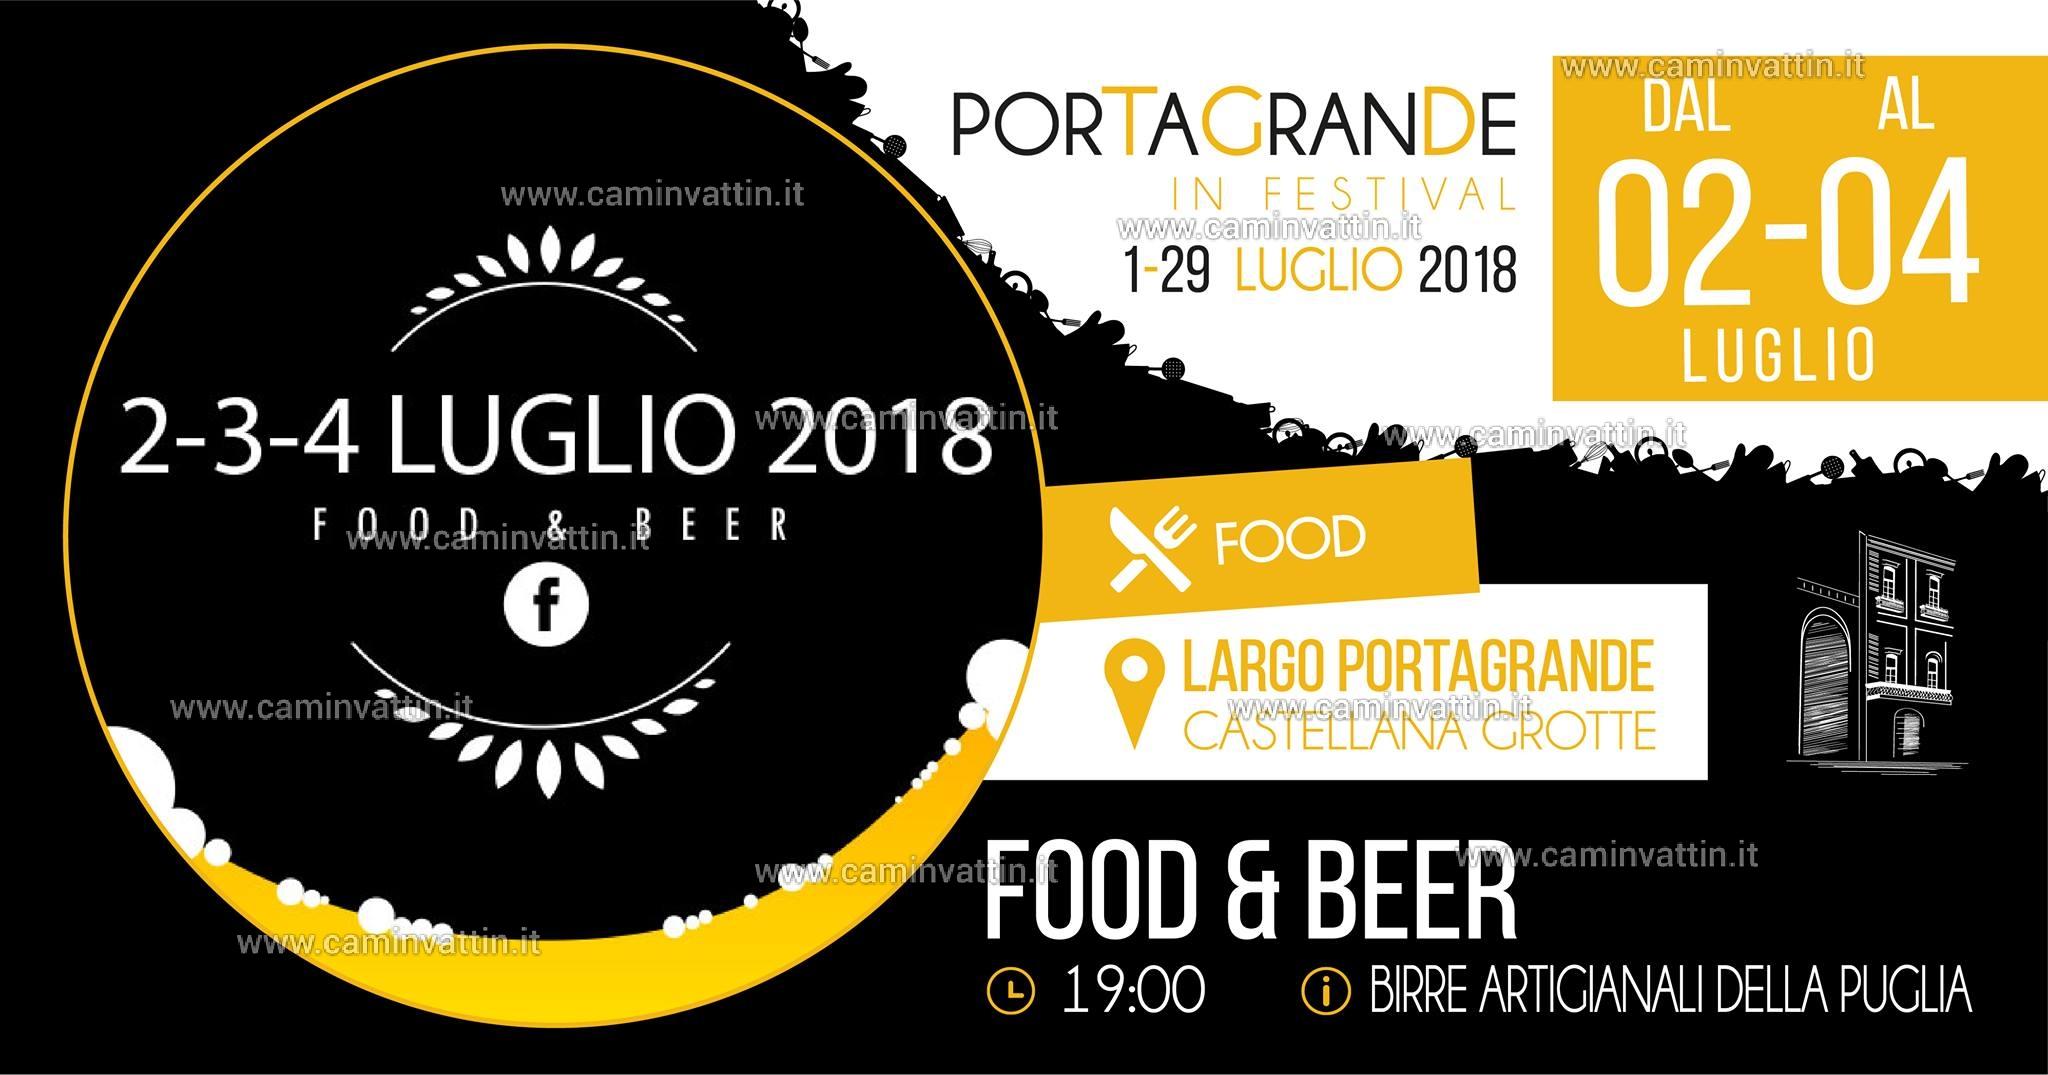 portagrande food beer festival